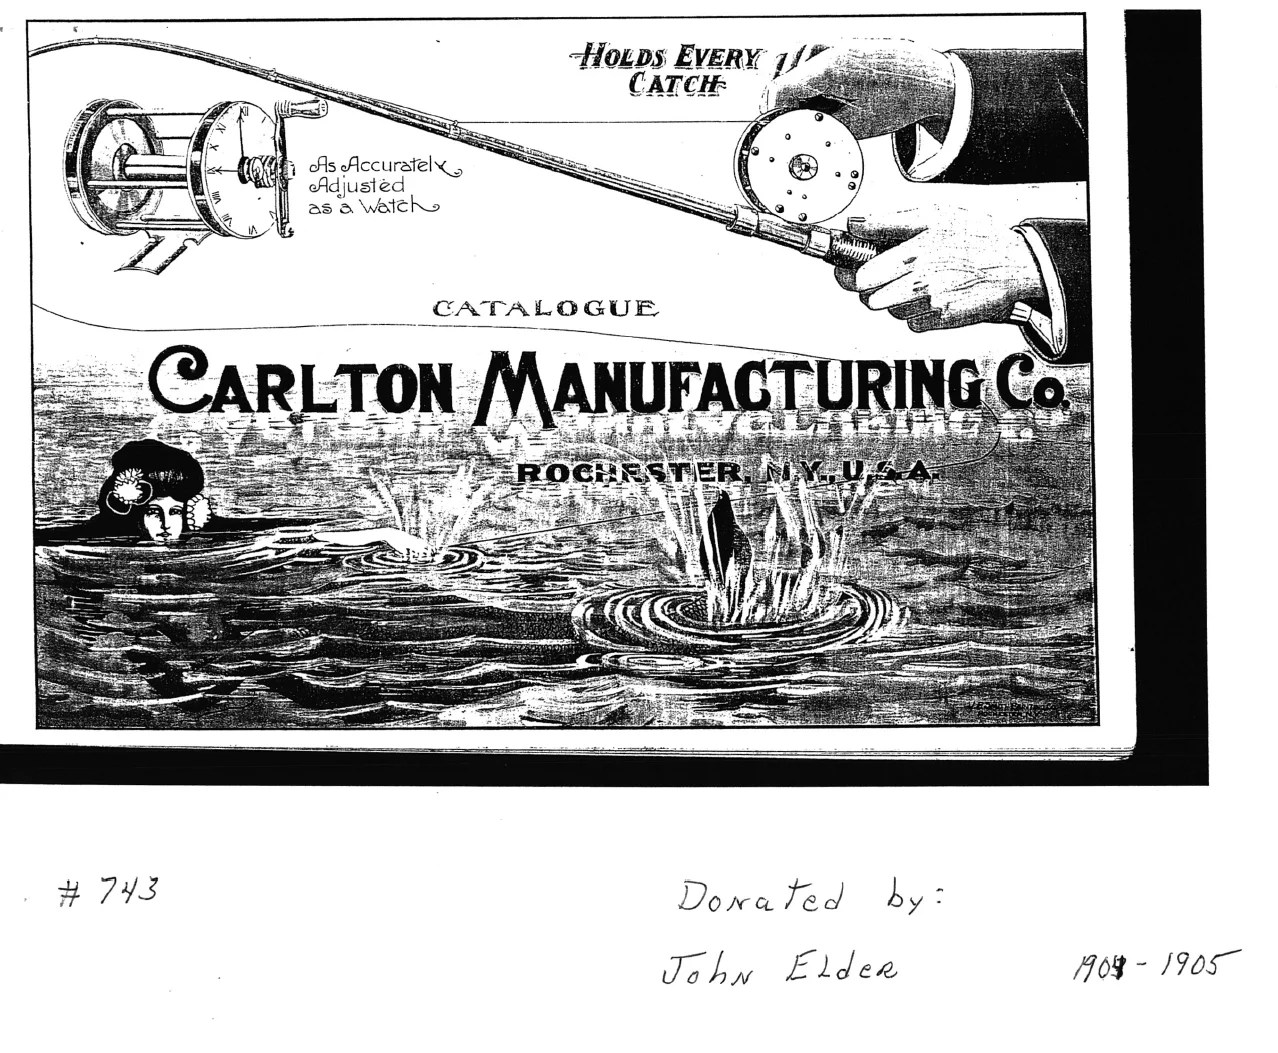 Carlton Manufacturing Co.